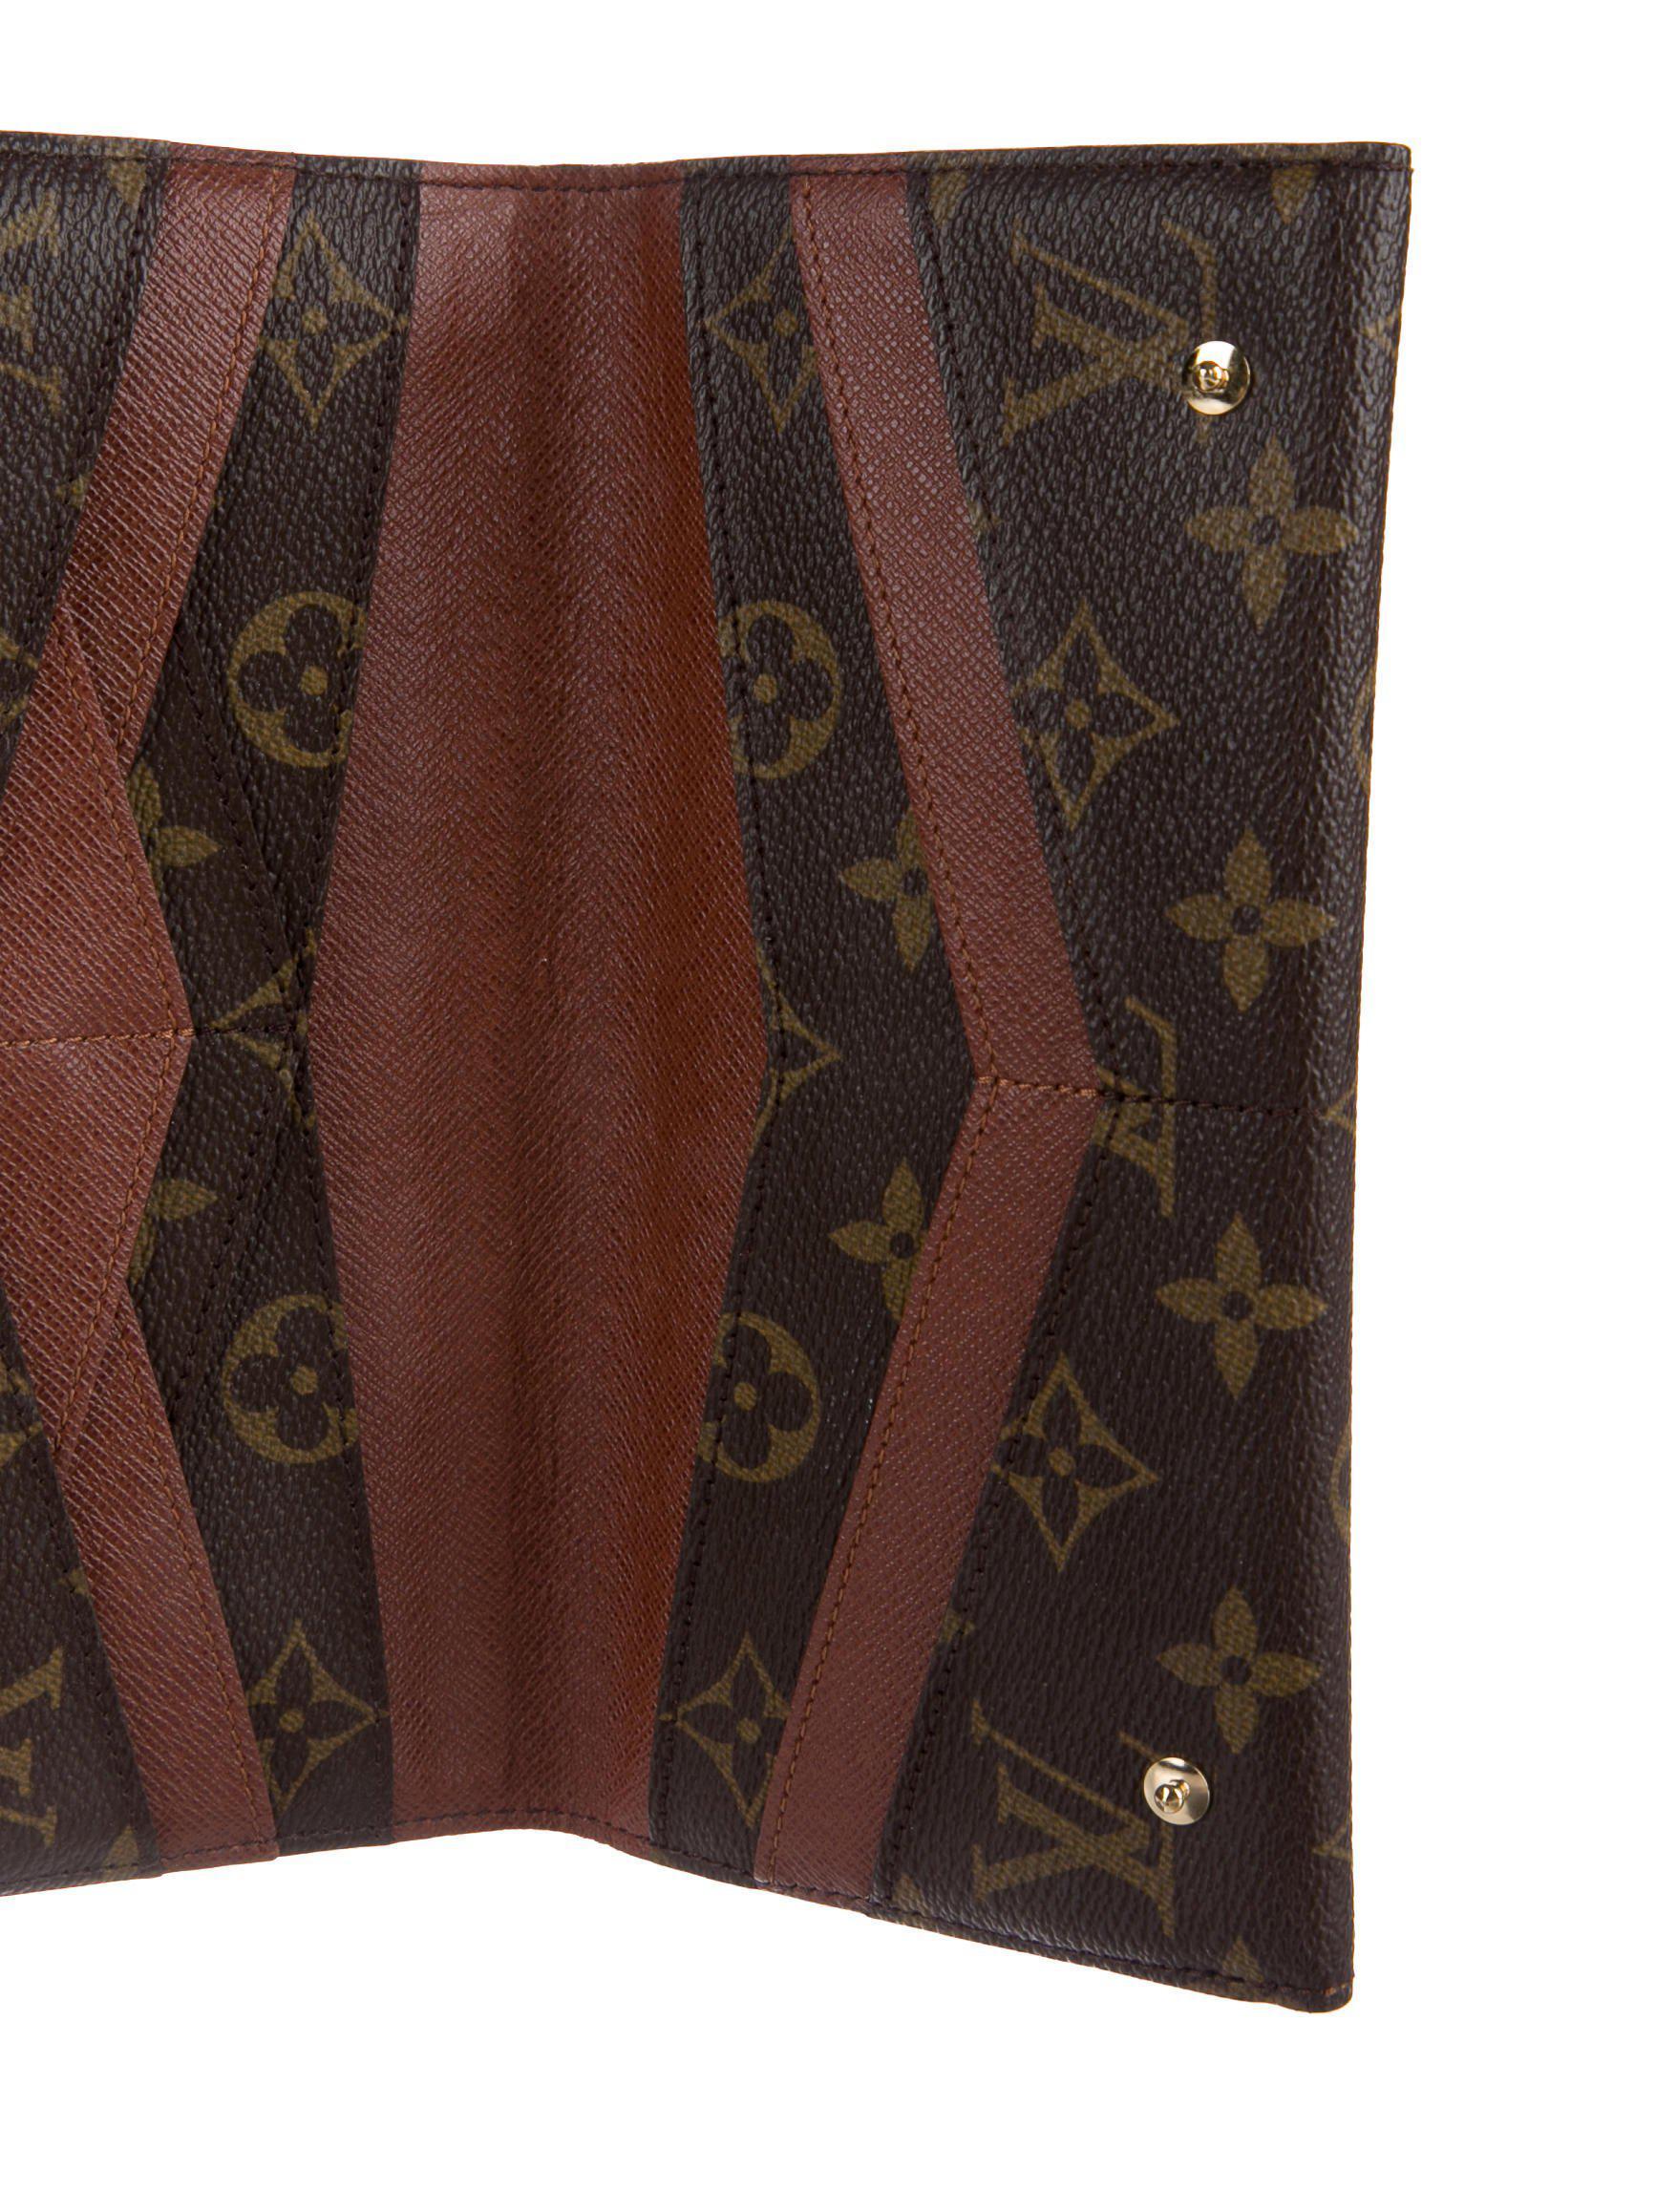 Lyst Louis Vuitton Monogram Origami Wallet Brown In Natural